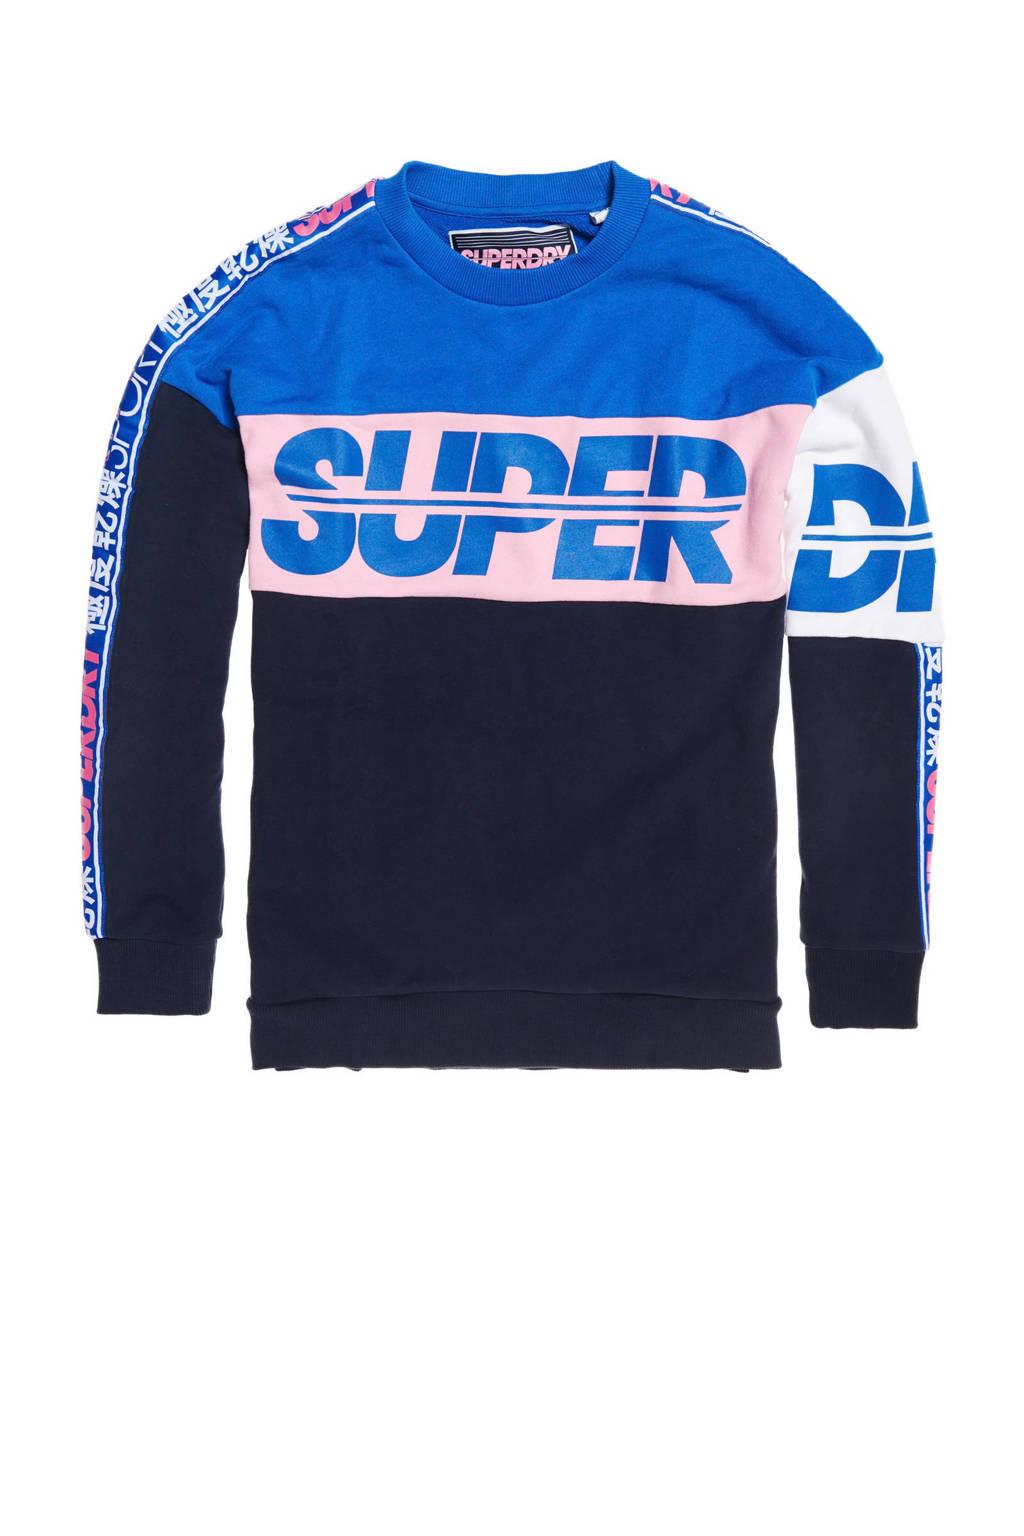 Superdry Sport sweater blauw/roze/zwart, Blauw/roze/zwart